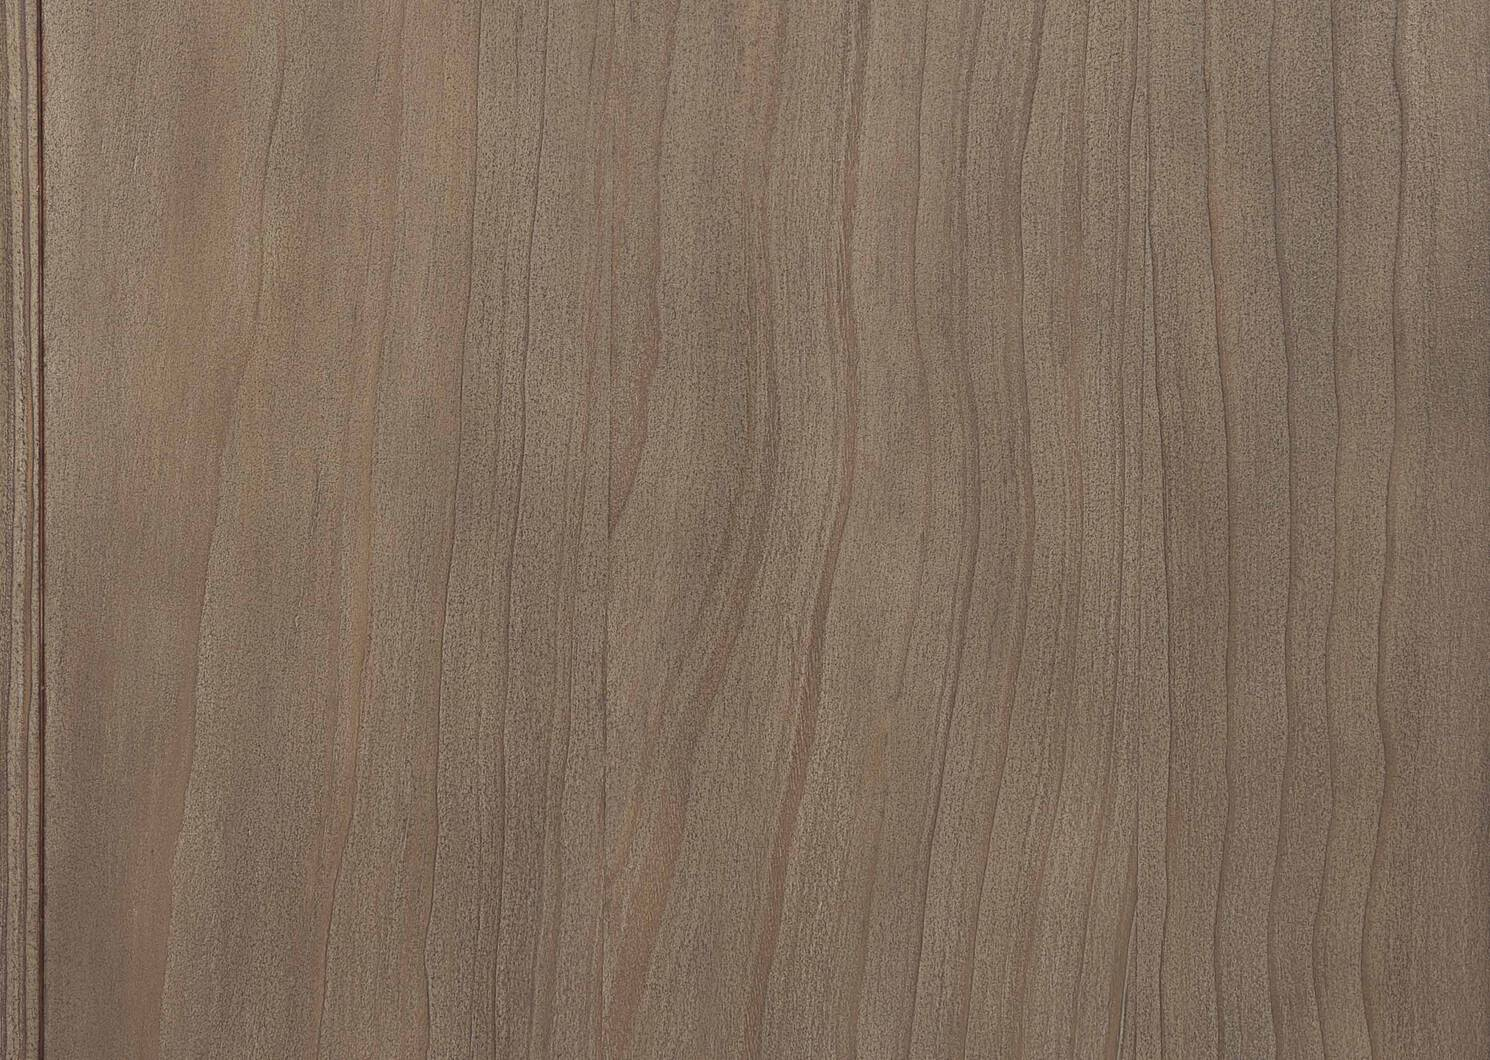 Luna 6 Drawer Dresser -Stone Pine